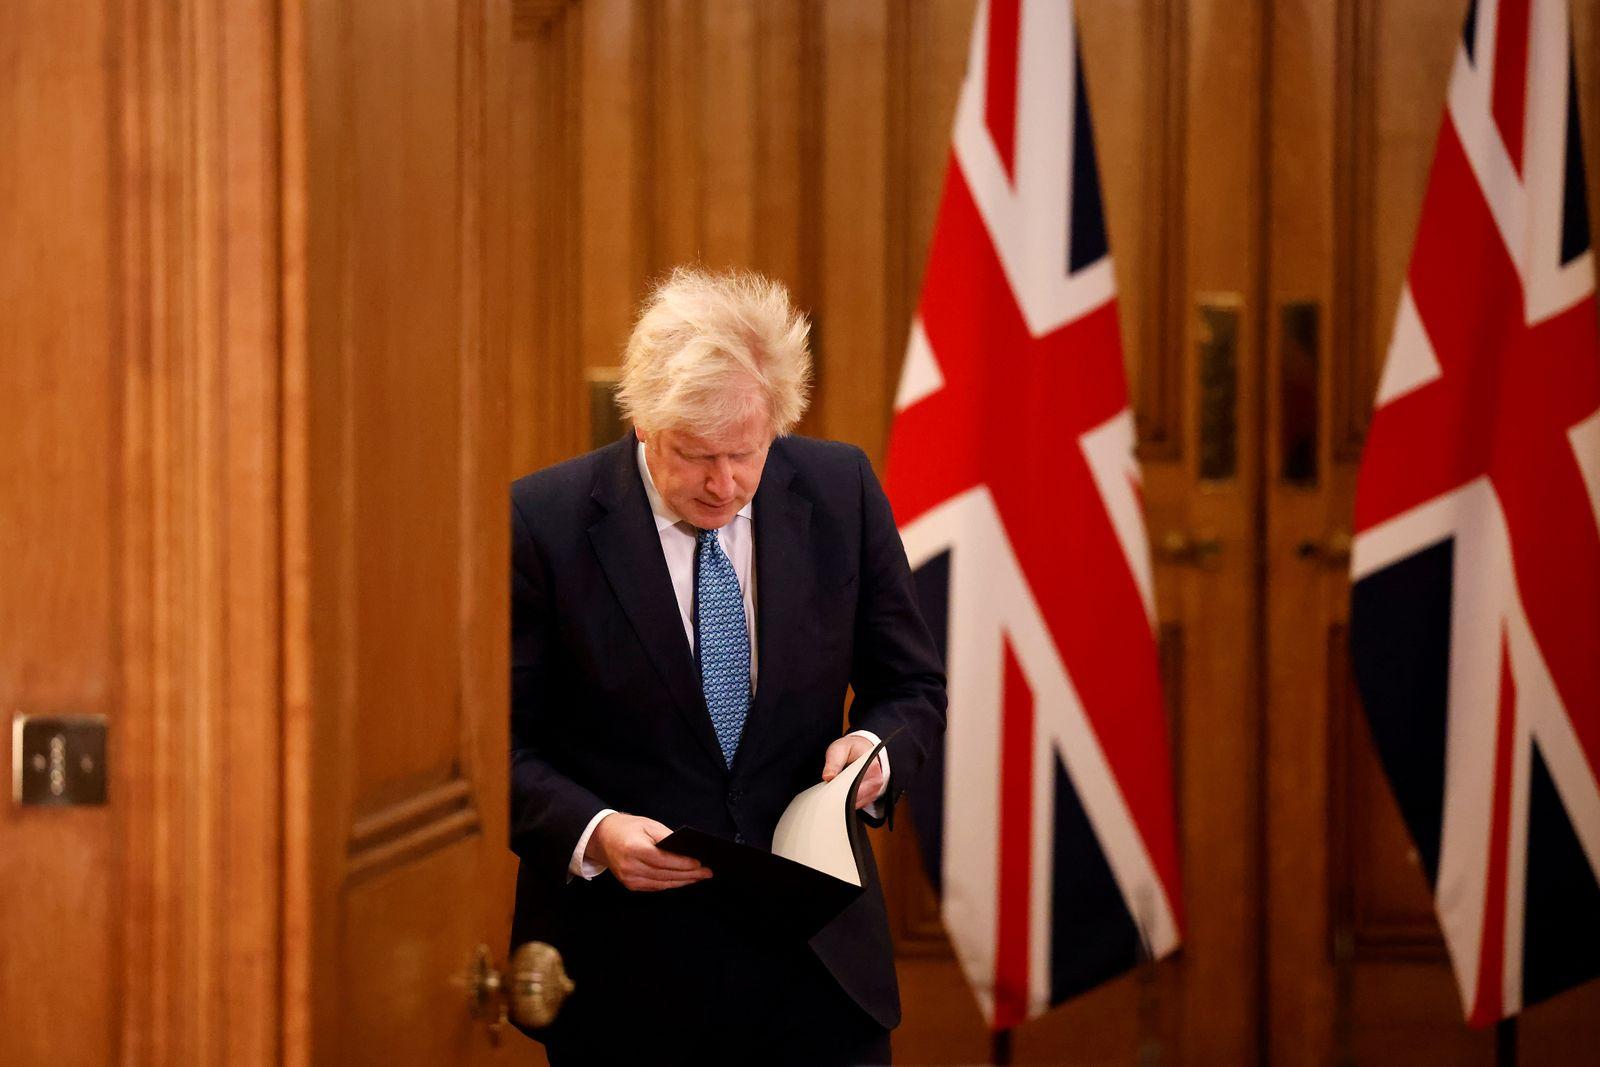 Boris Johnson Holds Virtual Press Conference On Latest Coronavirus Developments